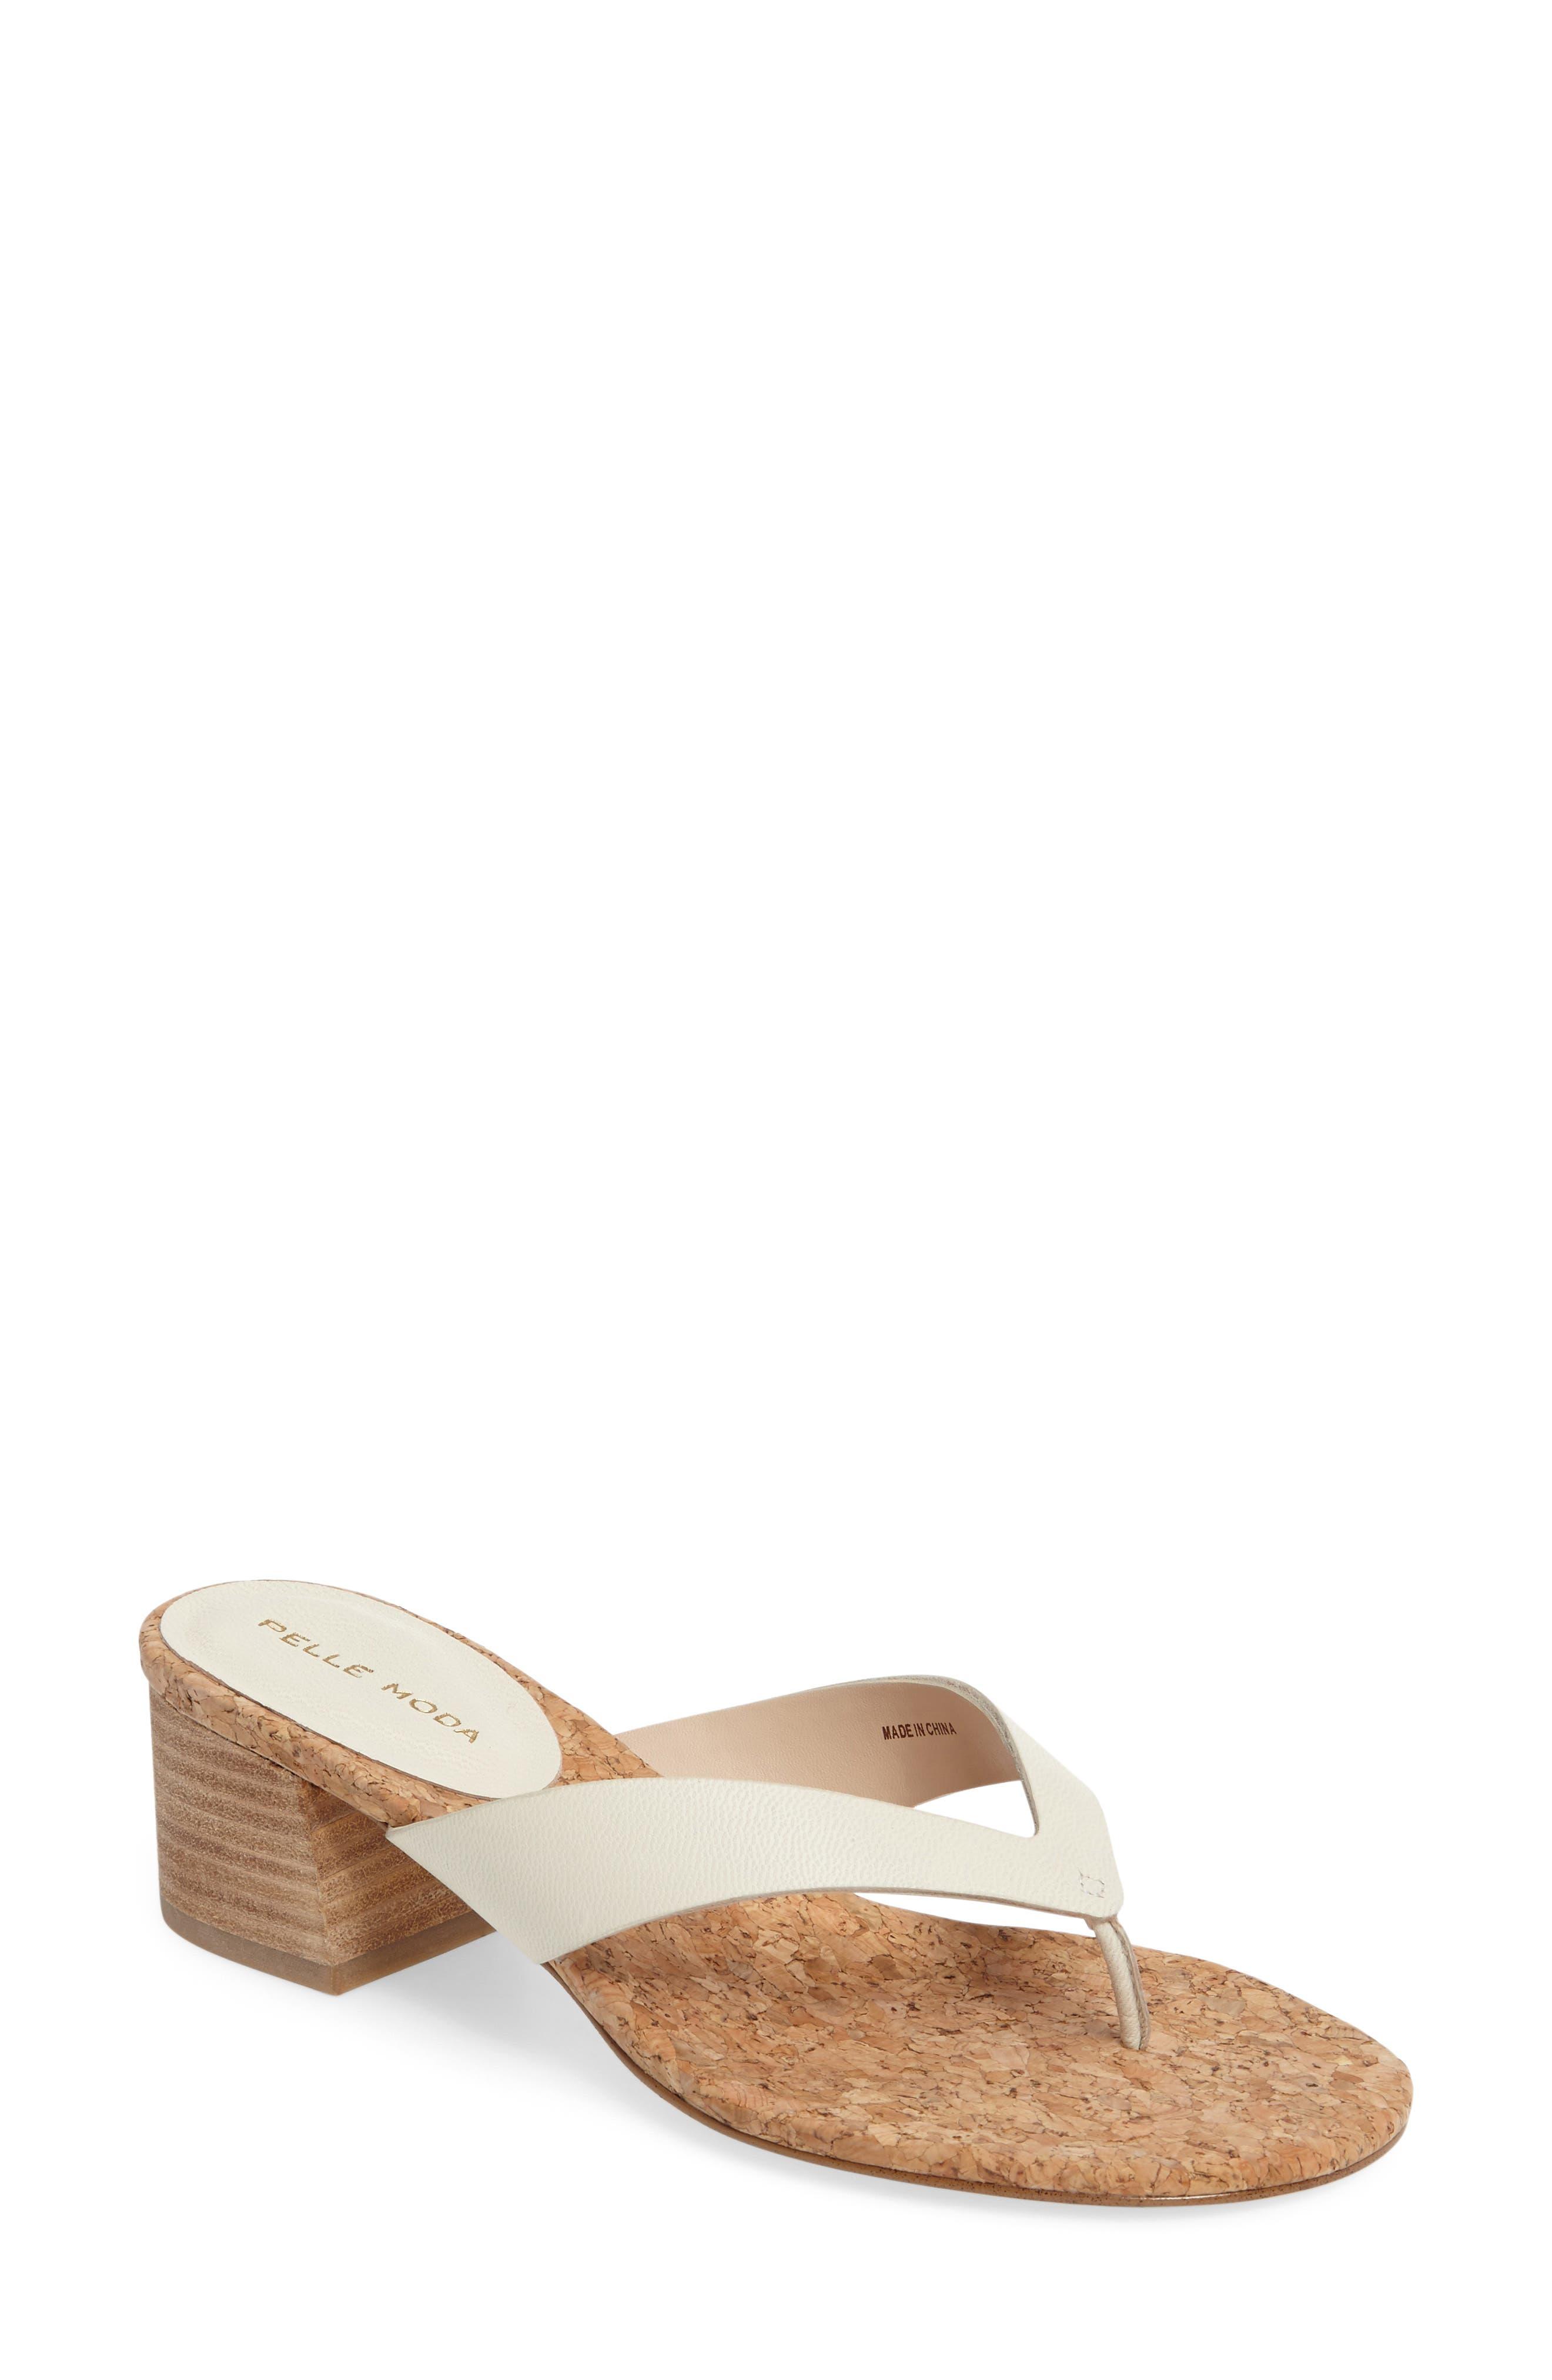 Meryl Sandal,                         Main,                         color, White Leather